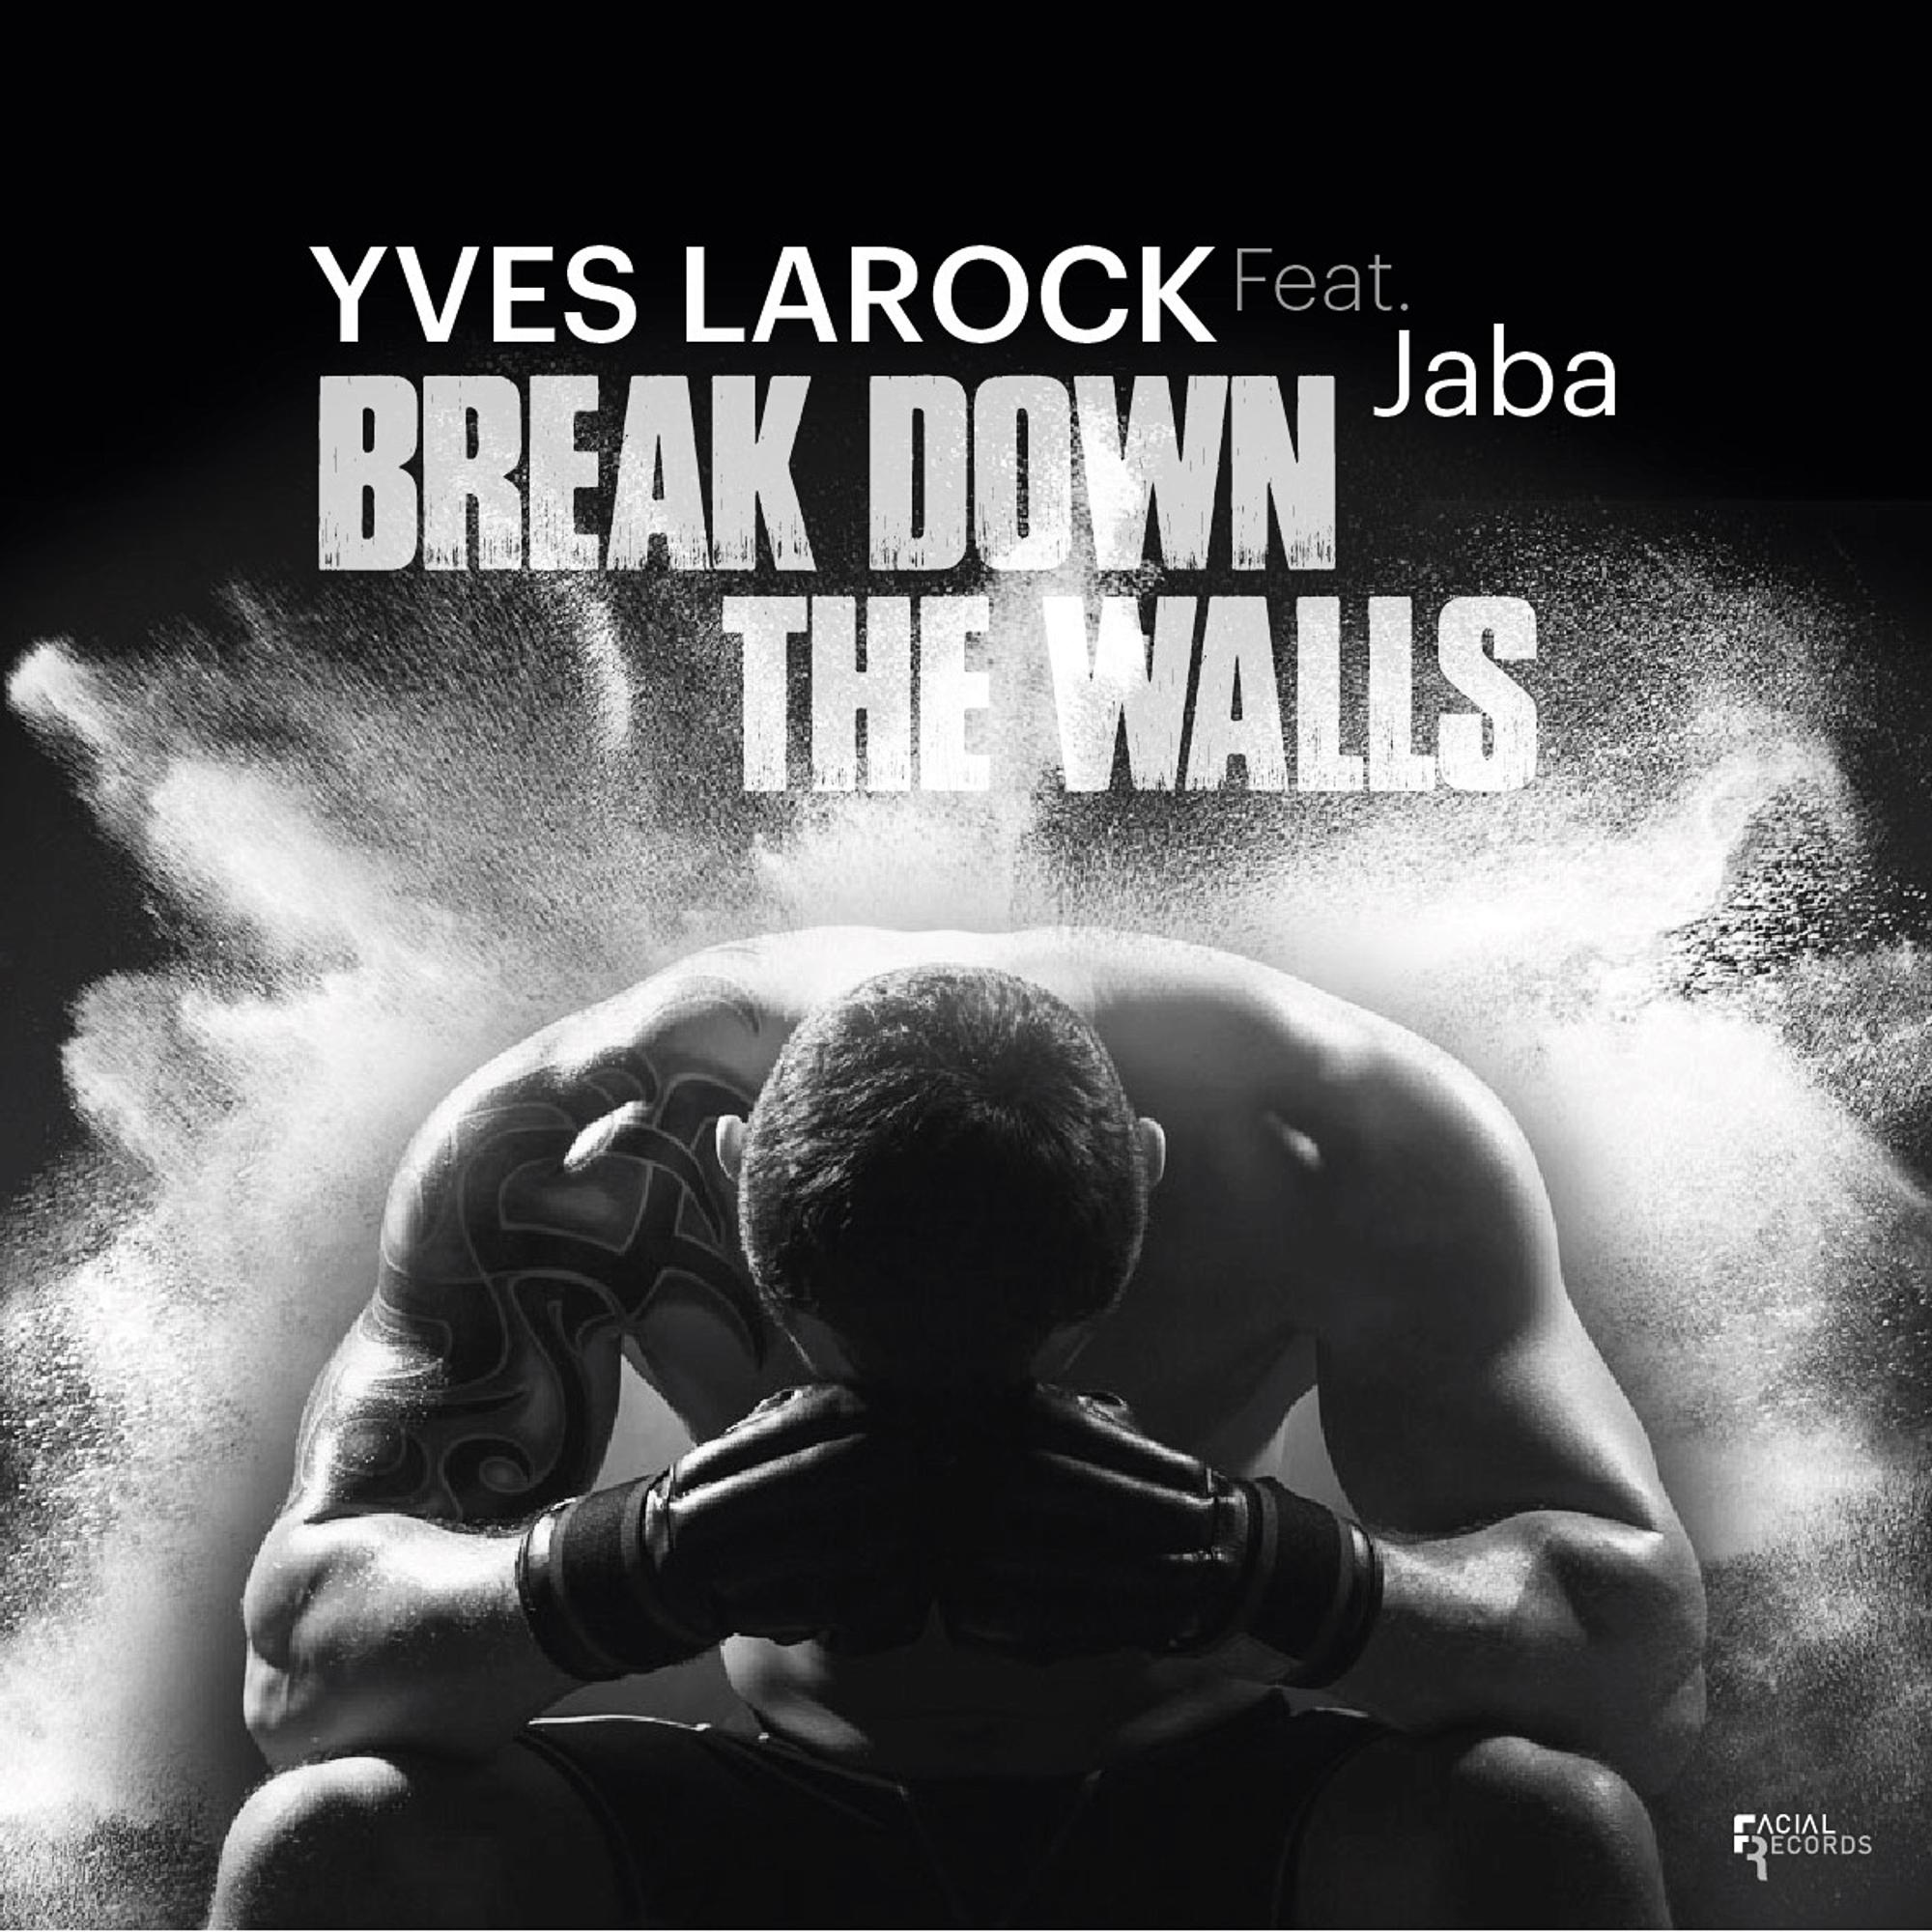 yves_larock_feat._jaba_-_break_down_the_walls_facial_recordsartwork.png